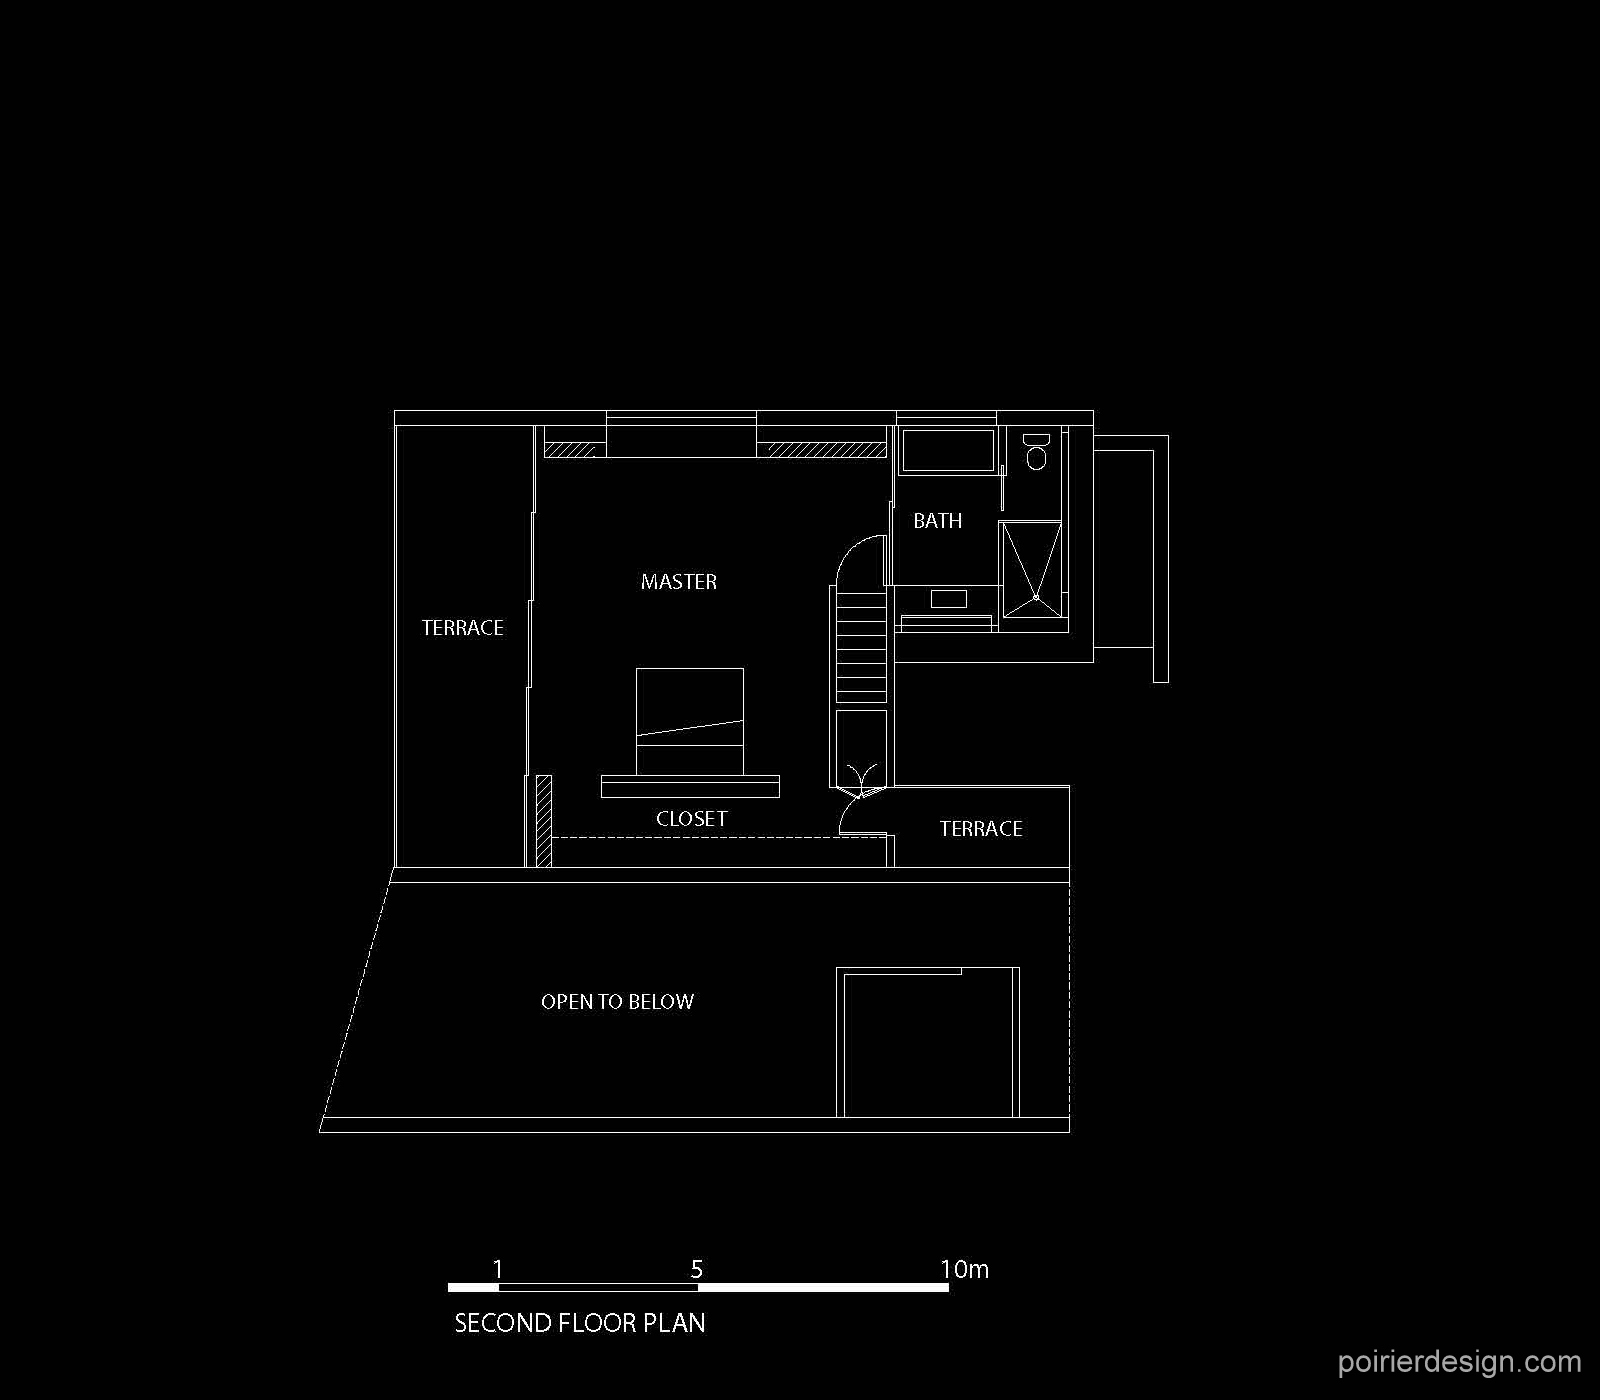 modern architecture, beach house, costa rican architecture, modern beach house, costa rica beach house, michael poirier, poirier design, ken jordan, richard bishop, crystal method